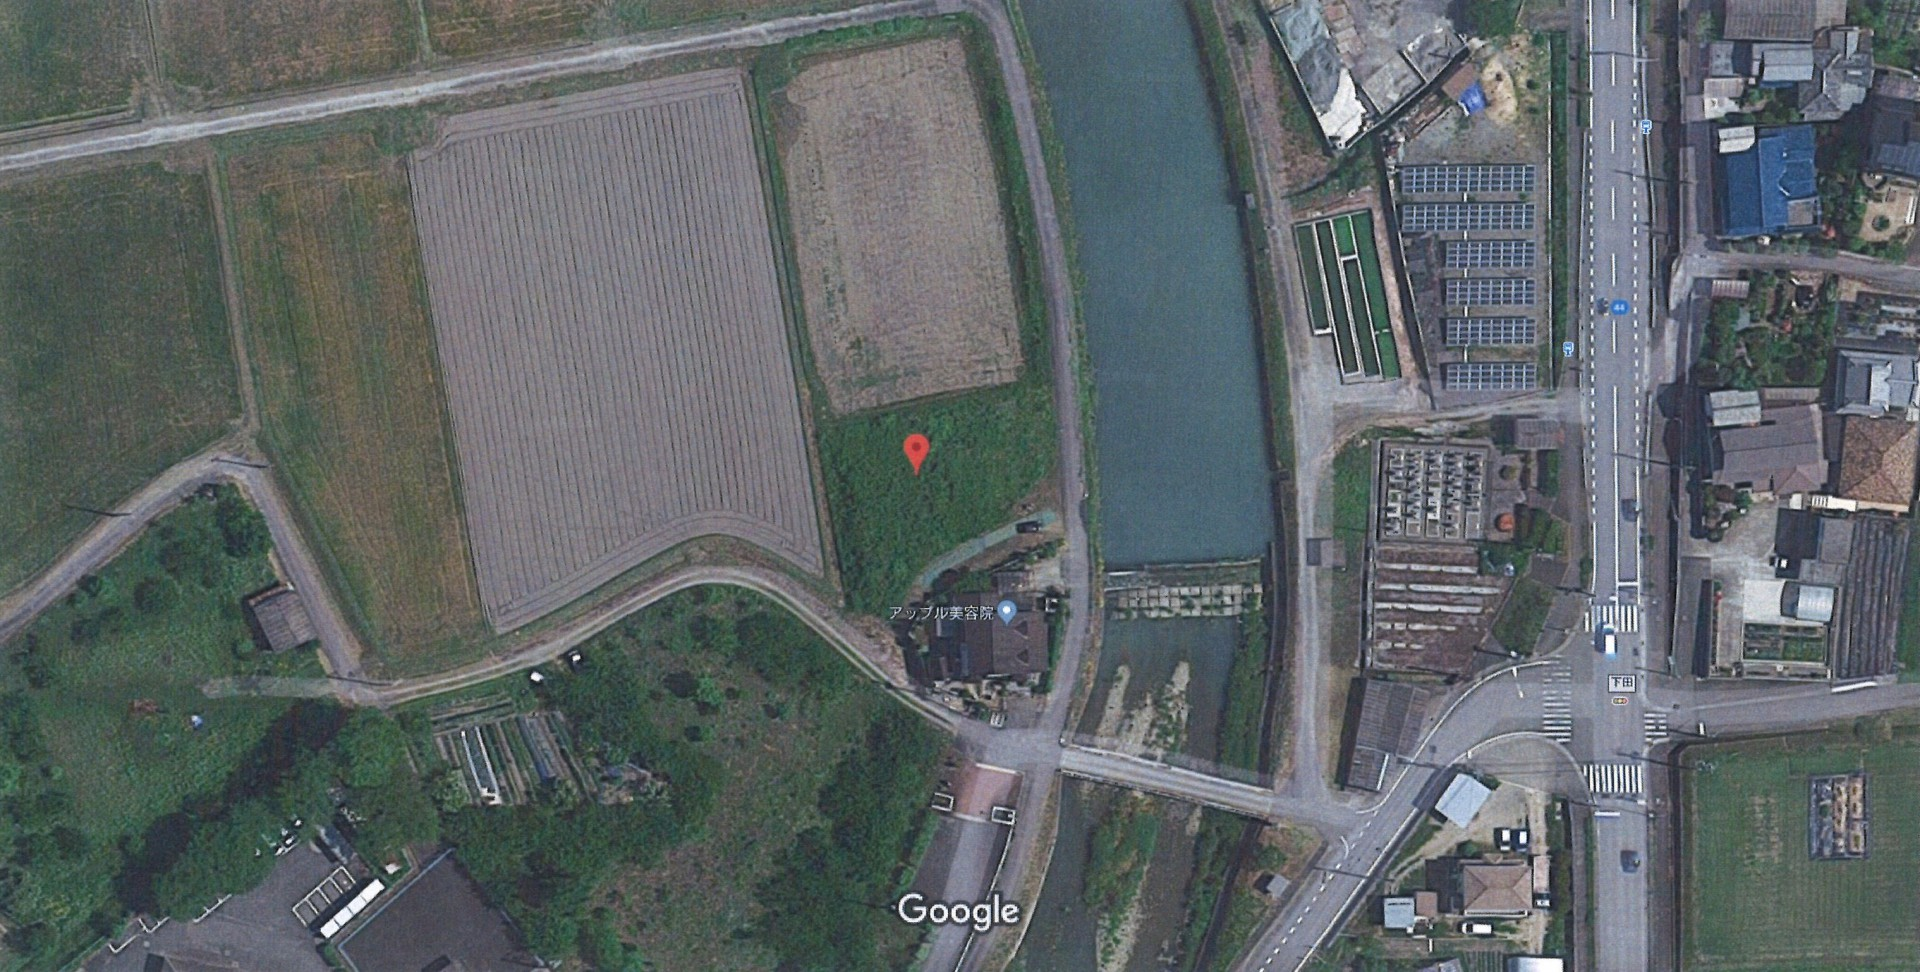 【JPN】FIT18円 兵庫県相生市発電所のメイン画像